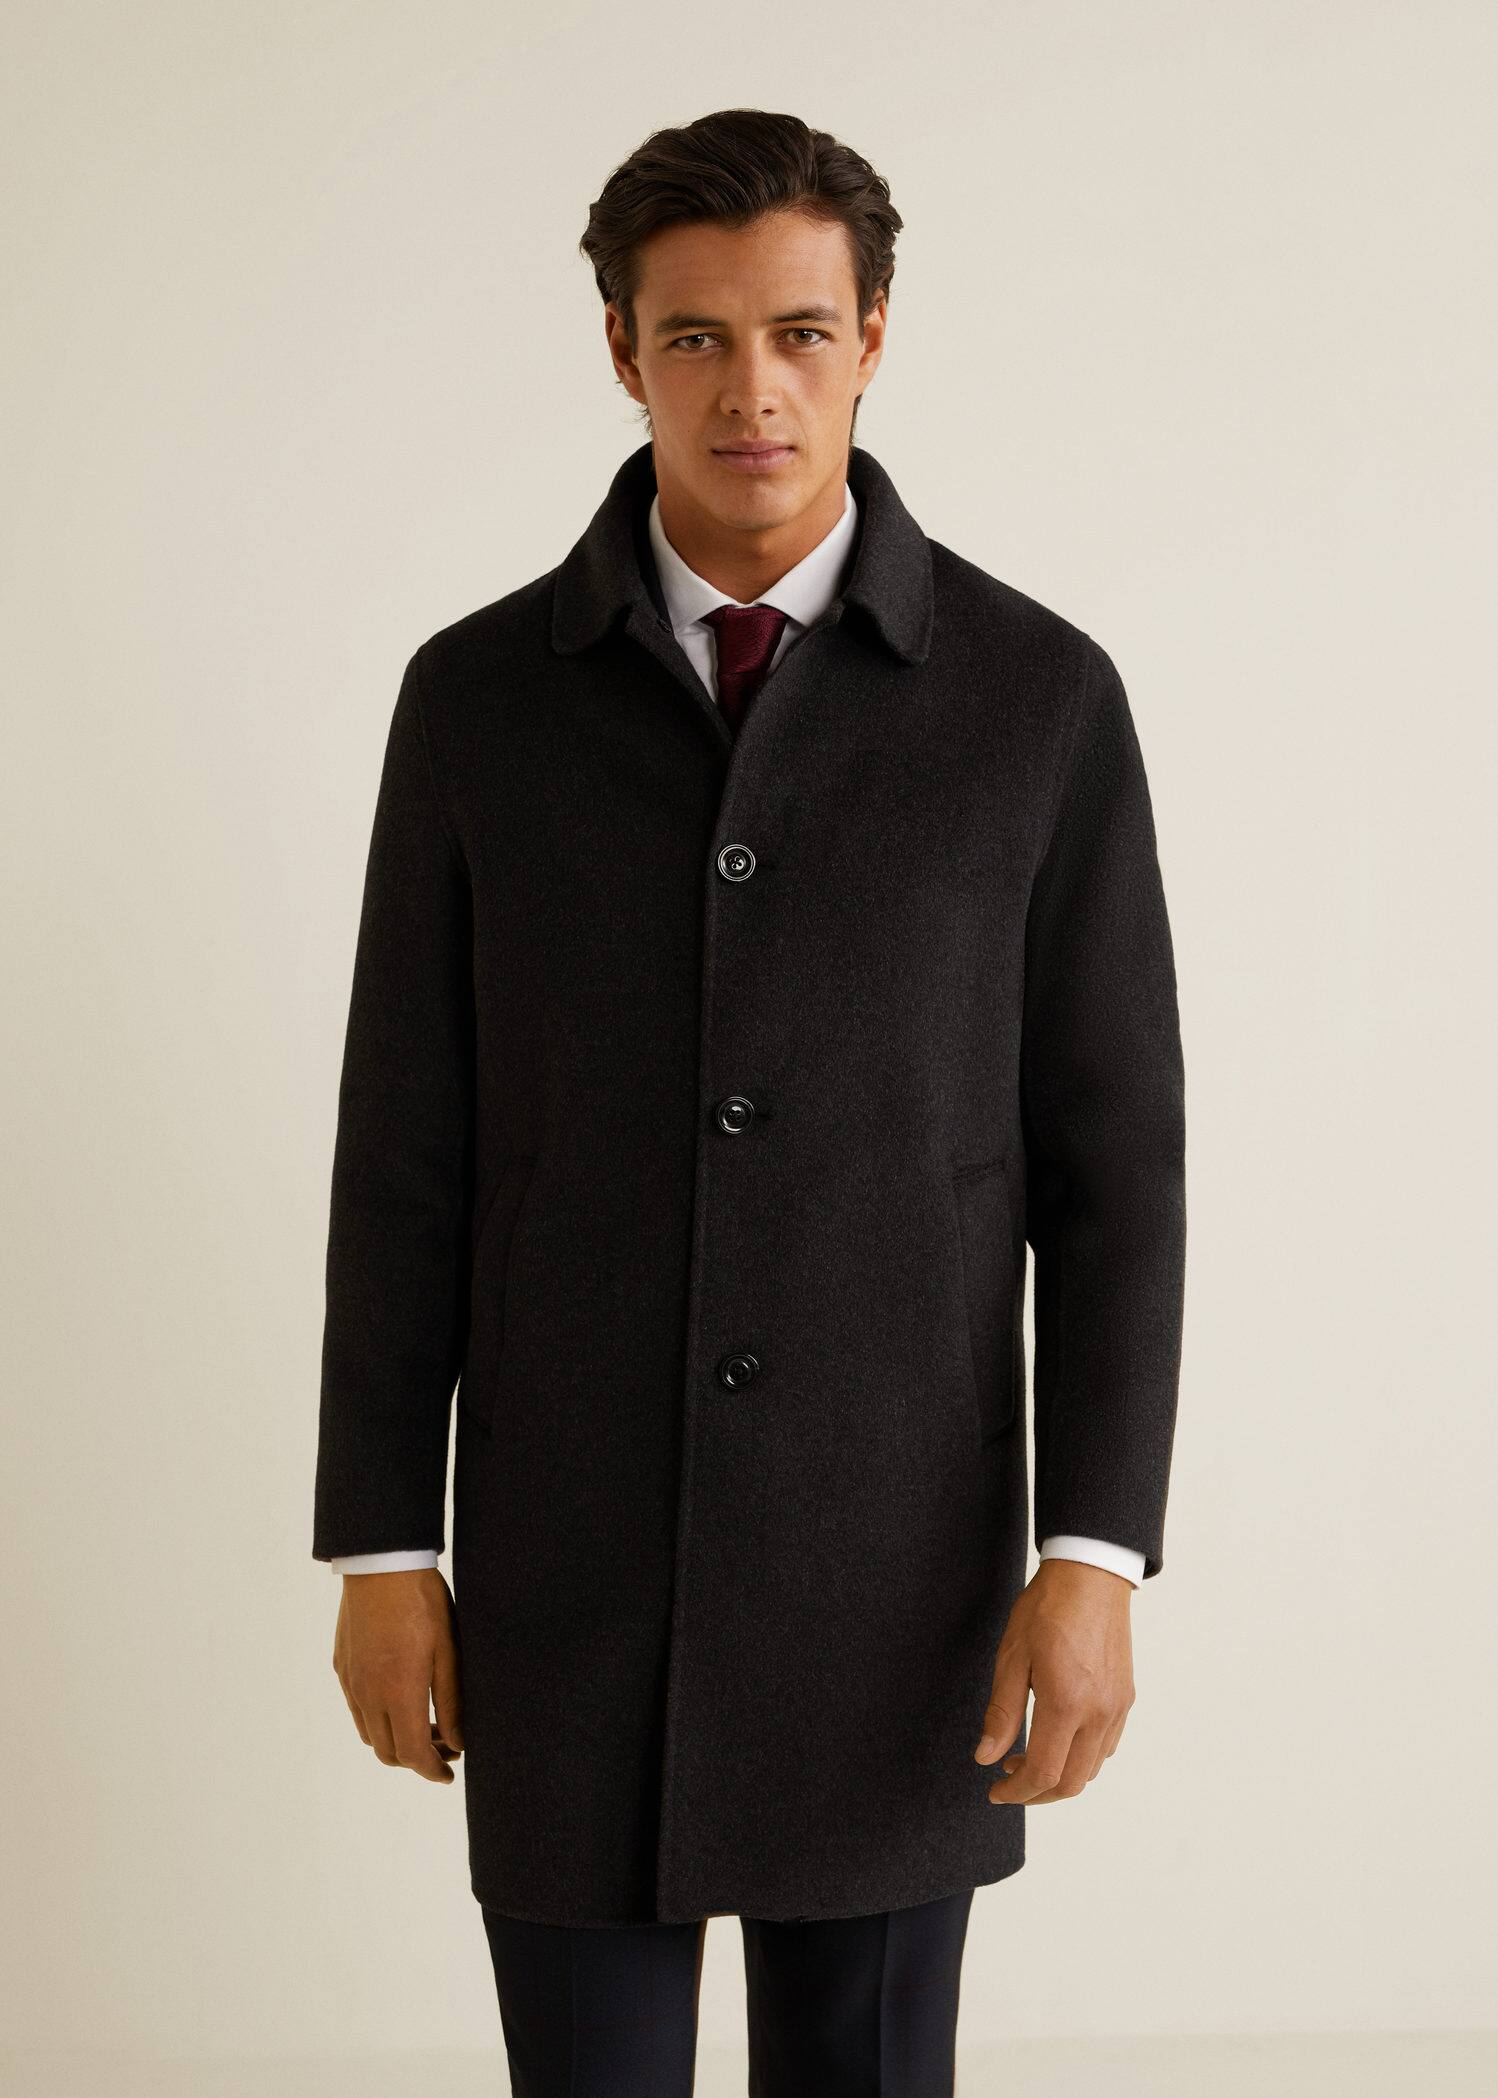 Abrigo Ecuador Man Mng Hombre Textura De Tailored Abrigos Lana OO1qS6wF